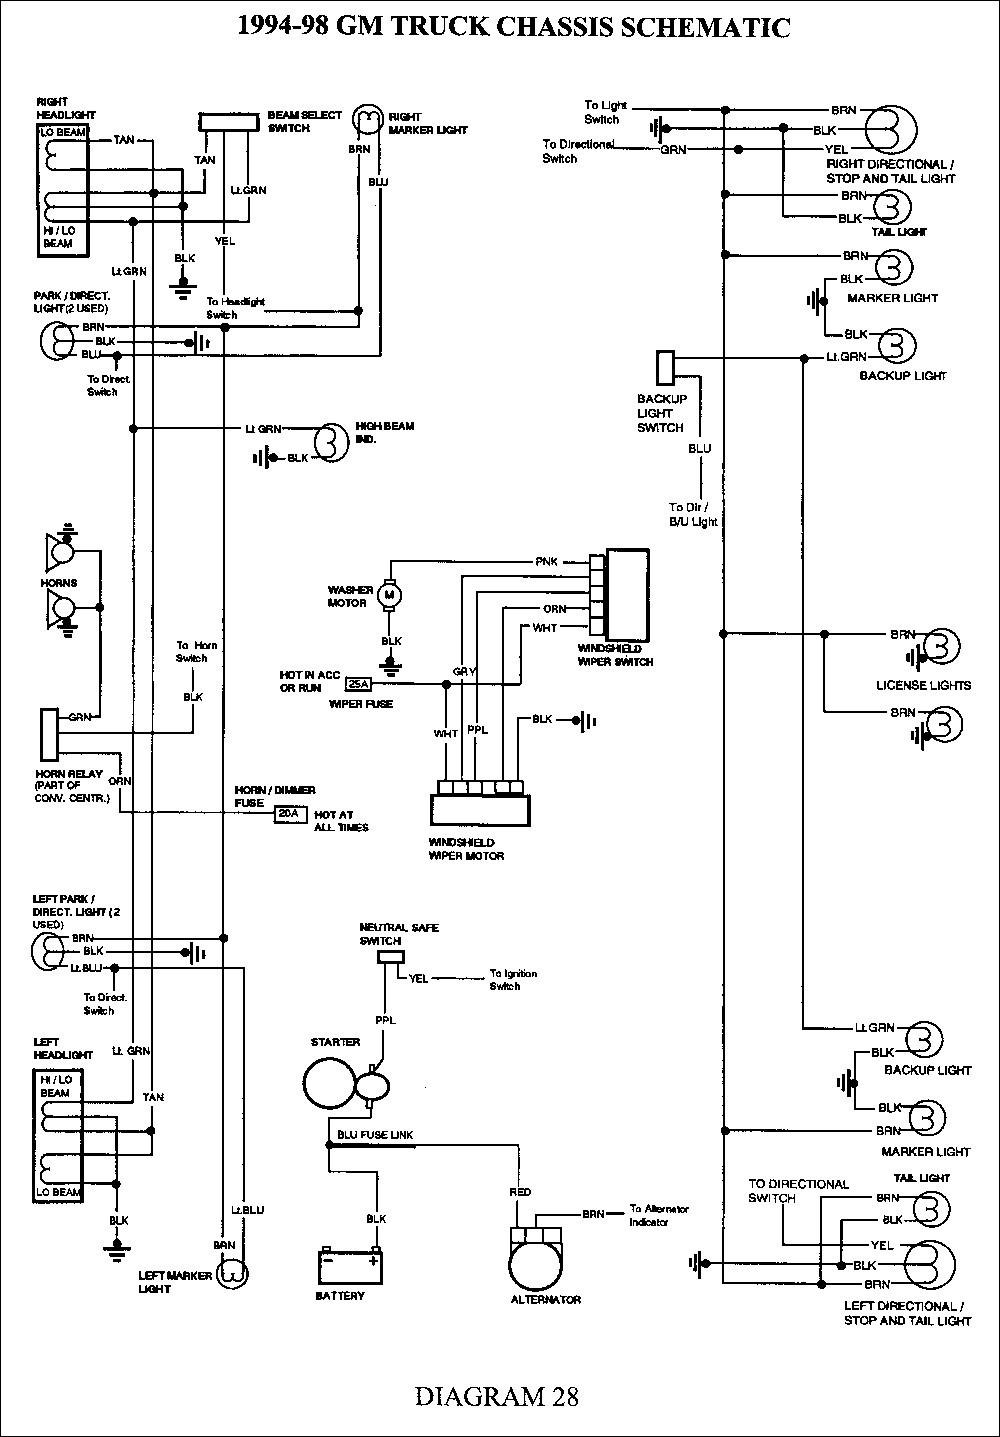 Light Switch Diagram Best Light Wireing Diagram Unique Best